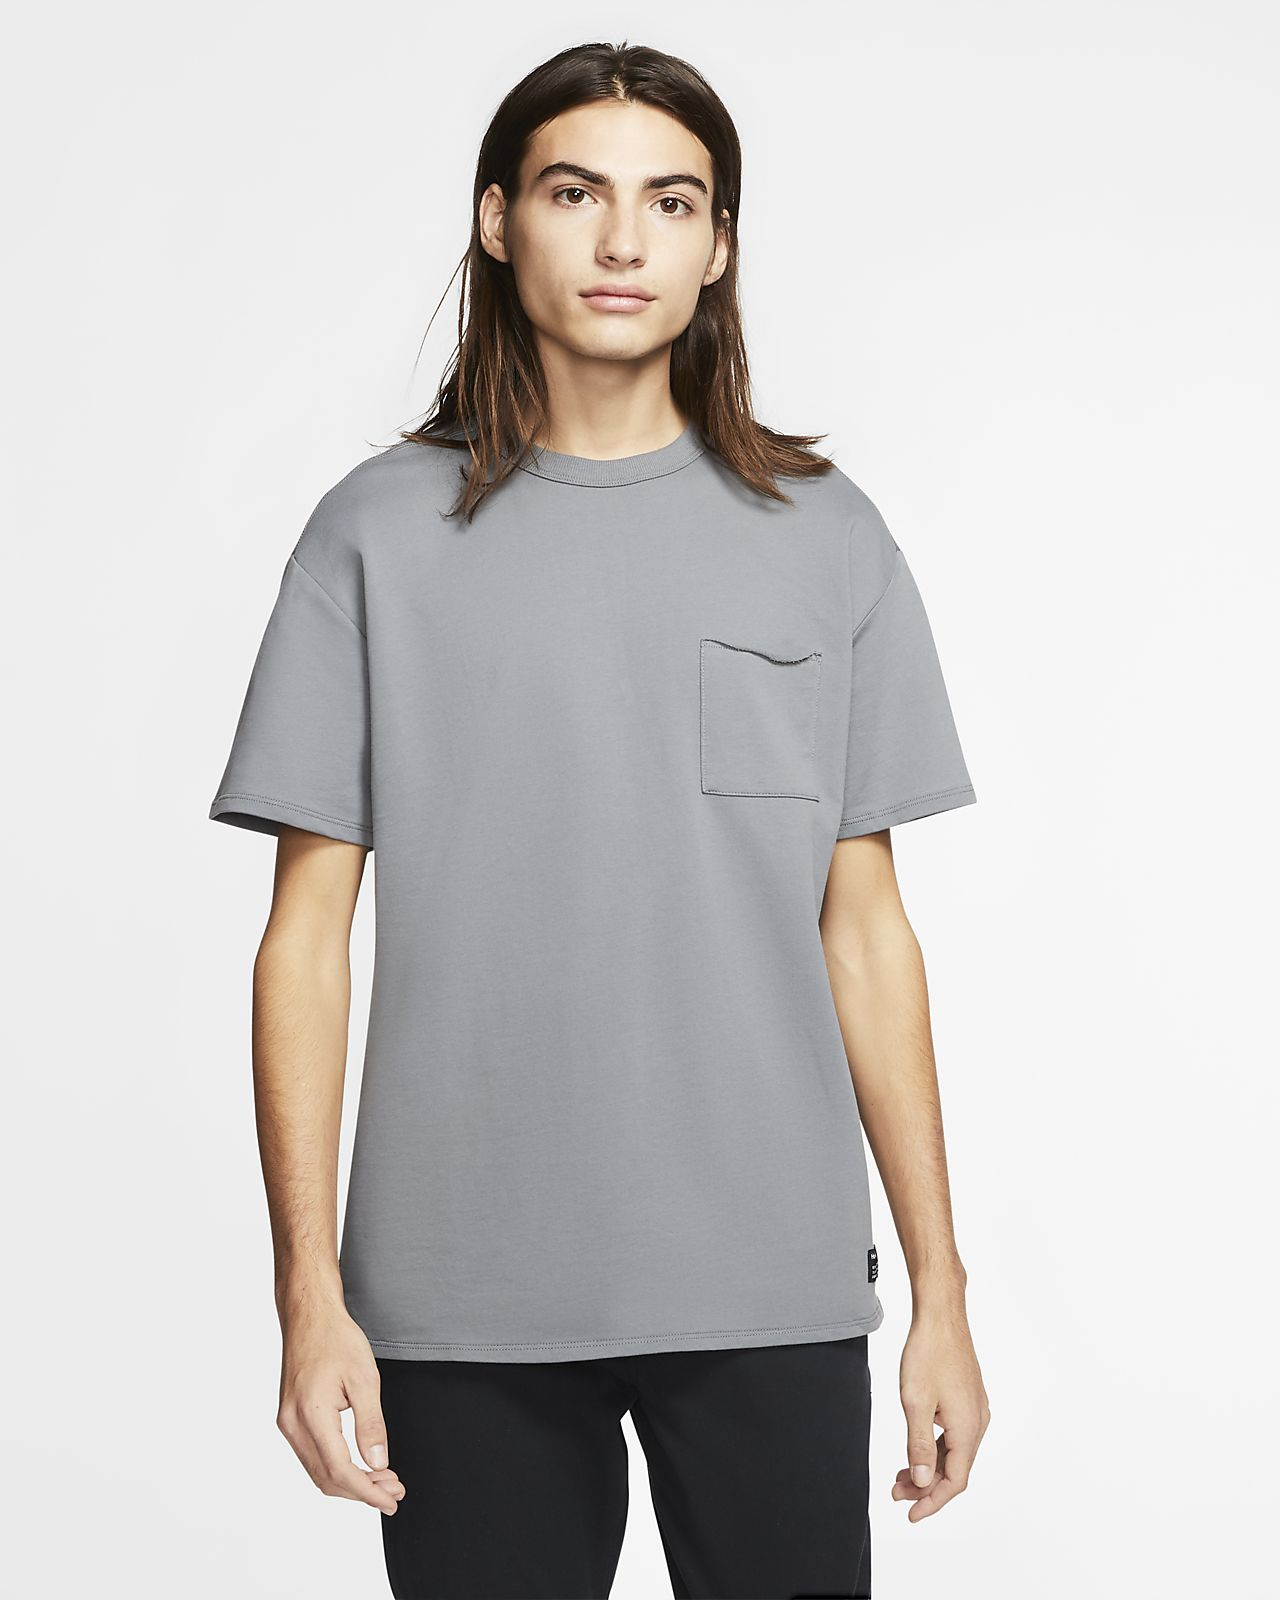 Hurley Ziggy Pocket Camiseta - Hombre